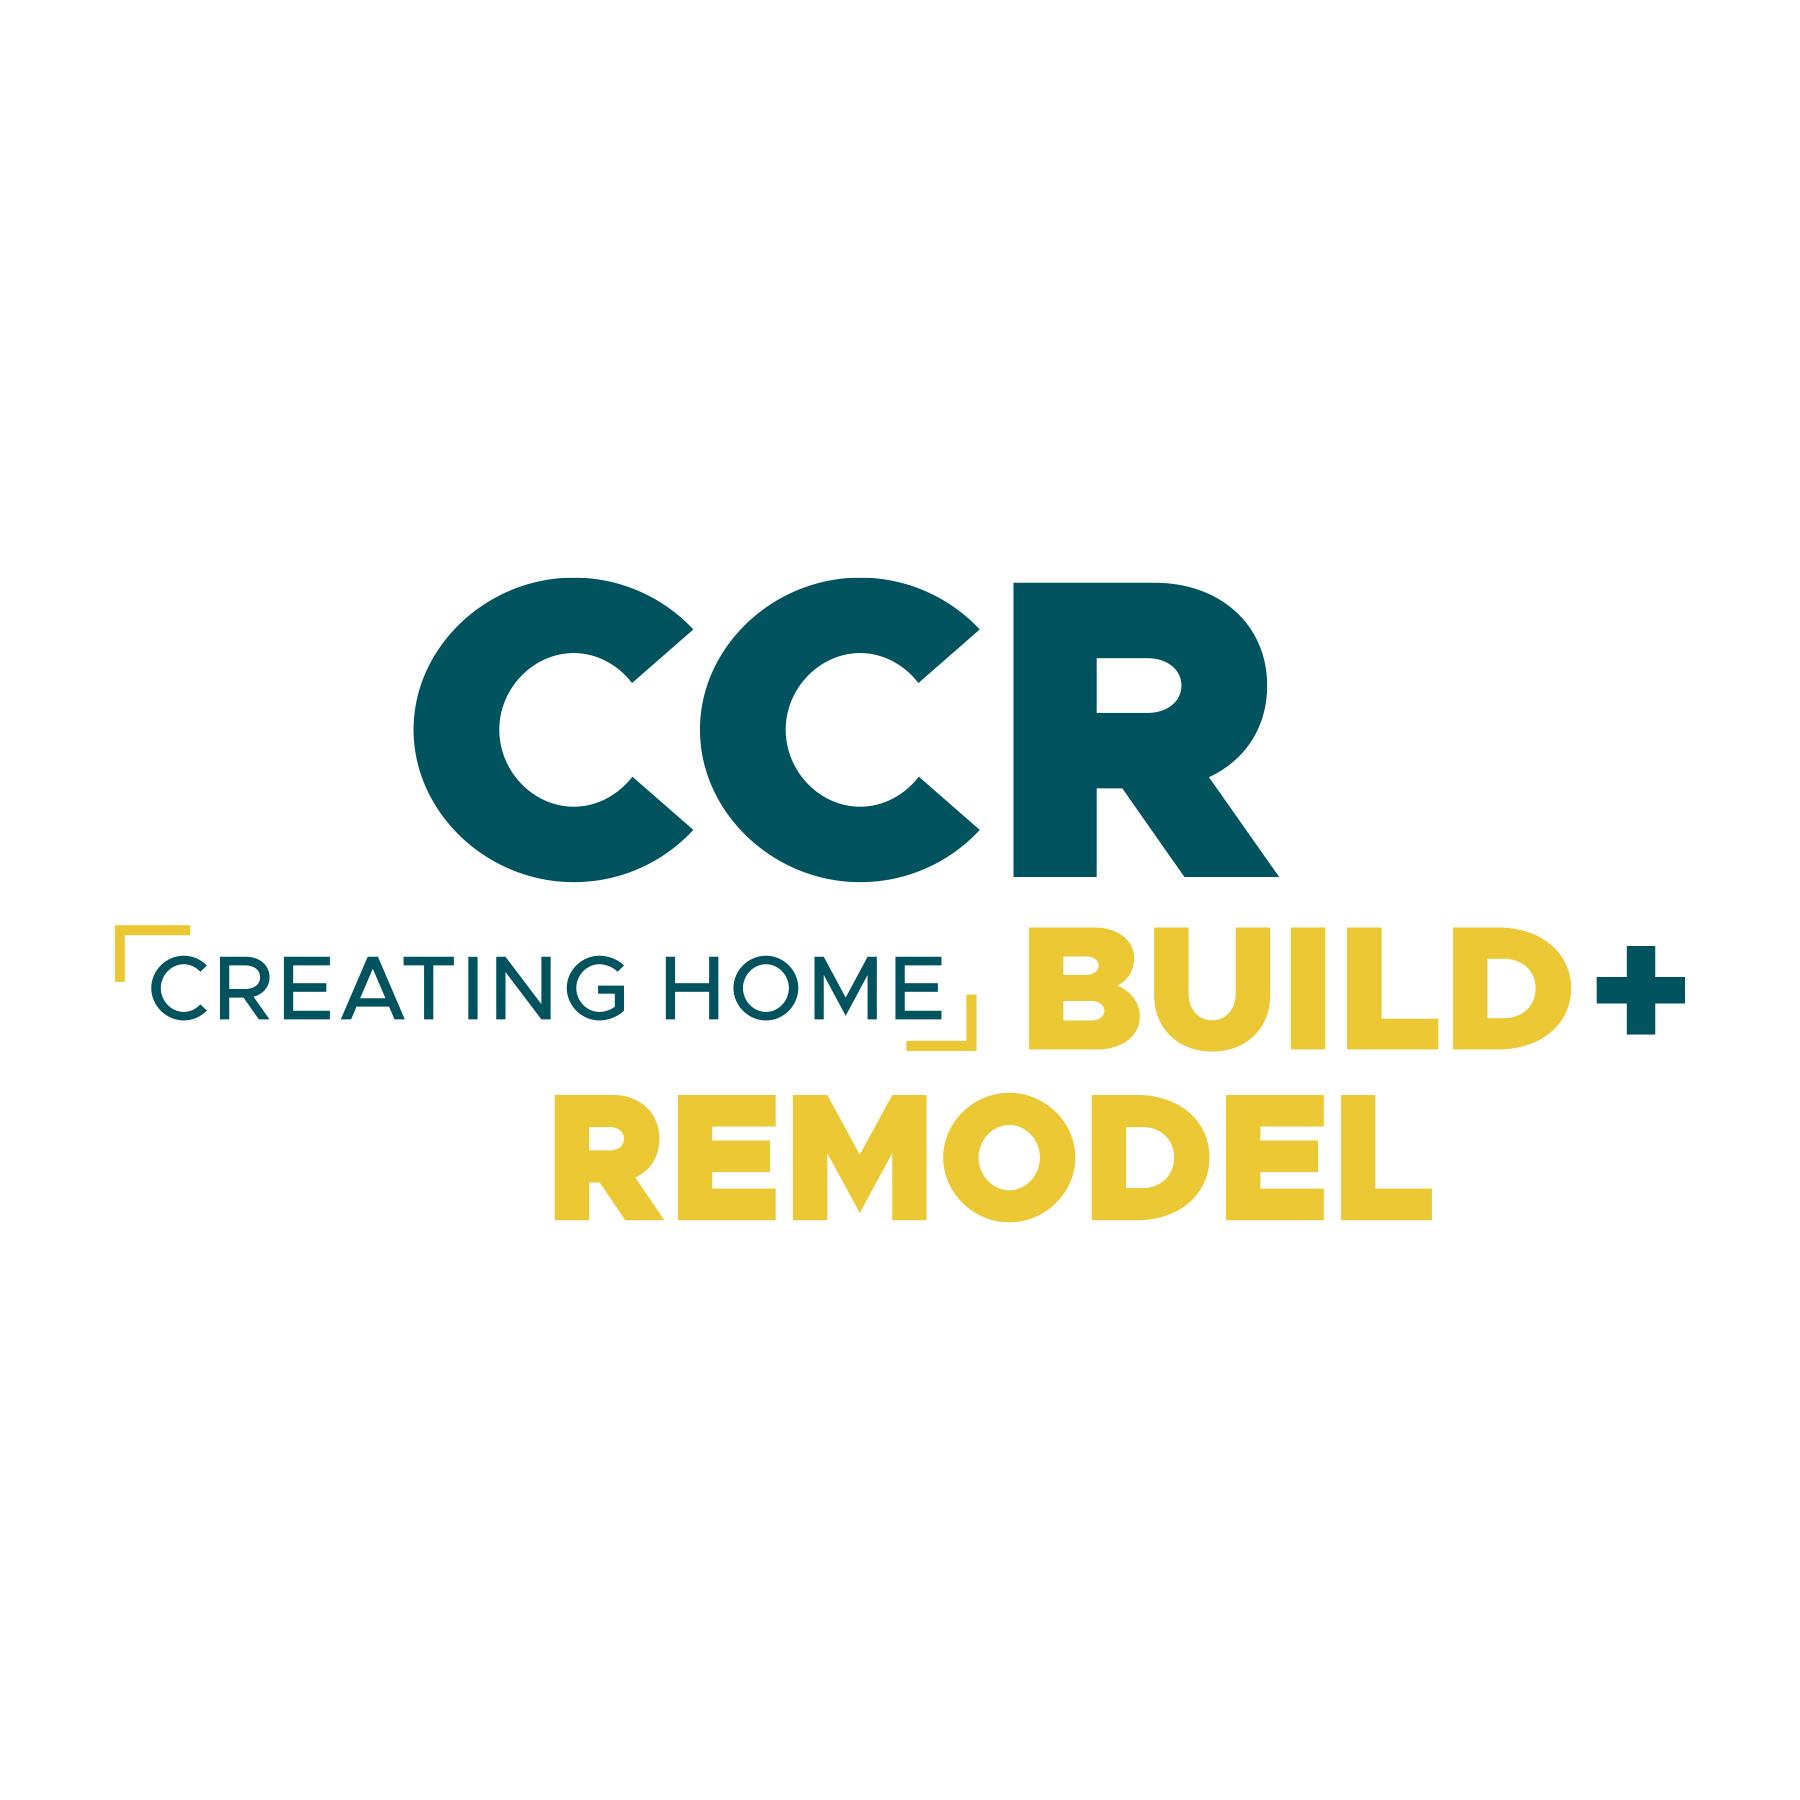 CCR Build + Remodel